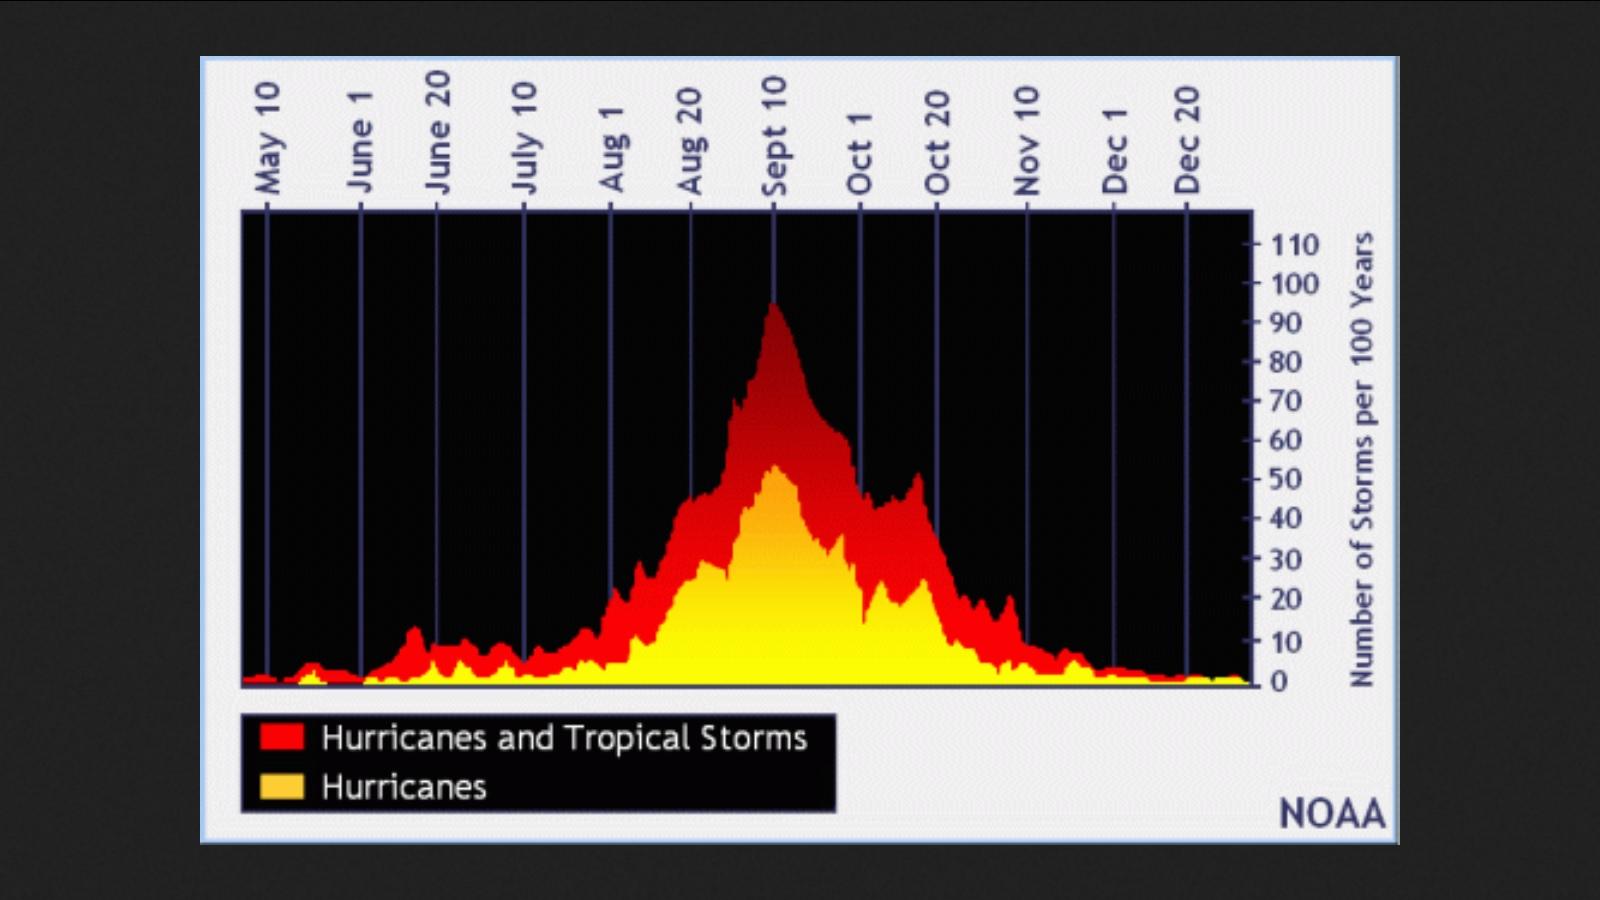 Peak of Hurricane Season.jpg